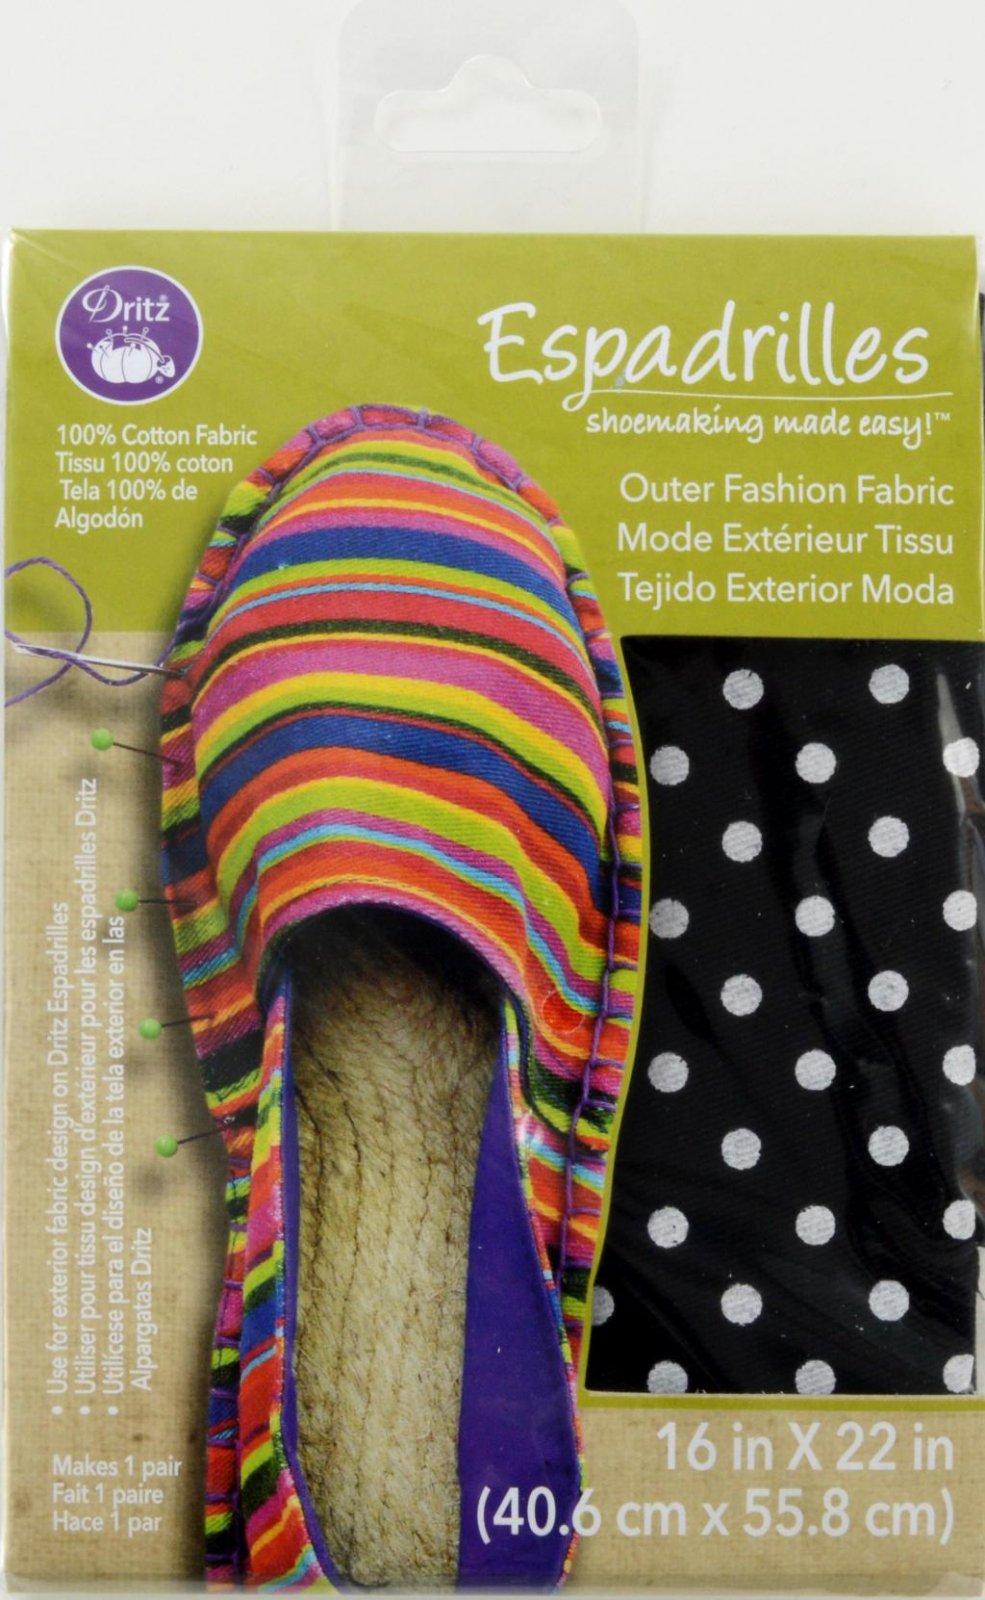 Espadrilles Shoemaking Outer Fashion Fabric Black